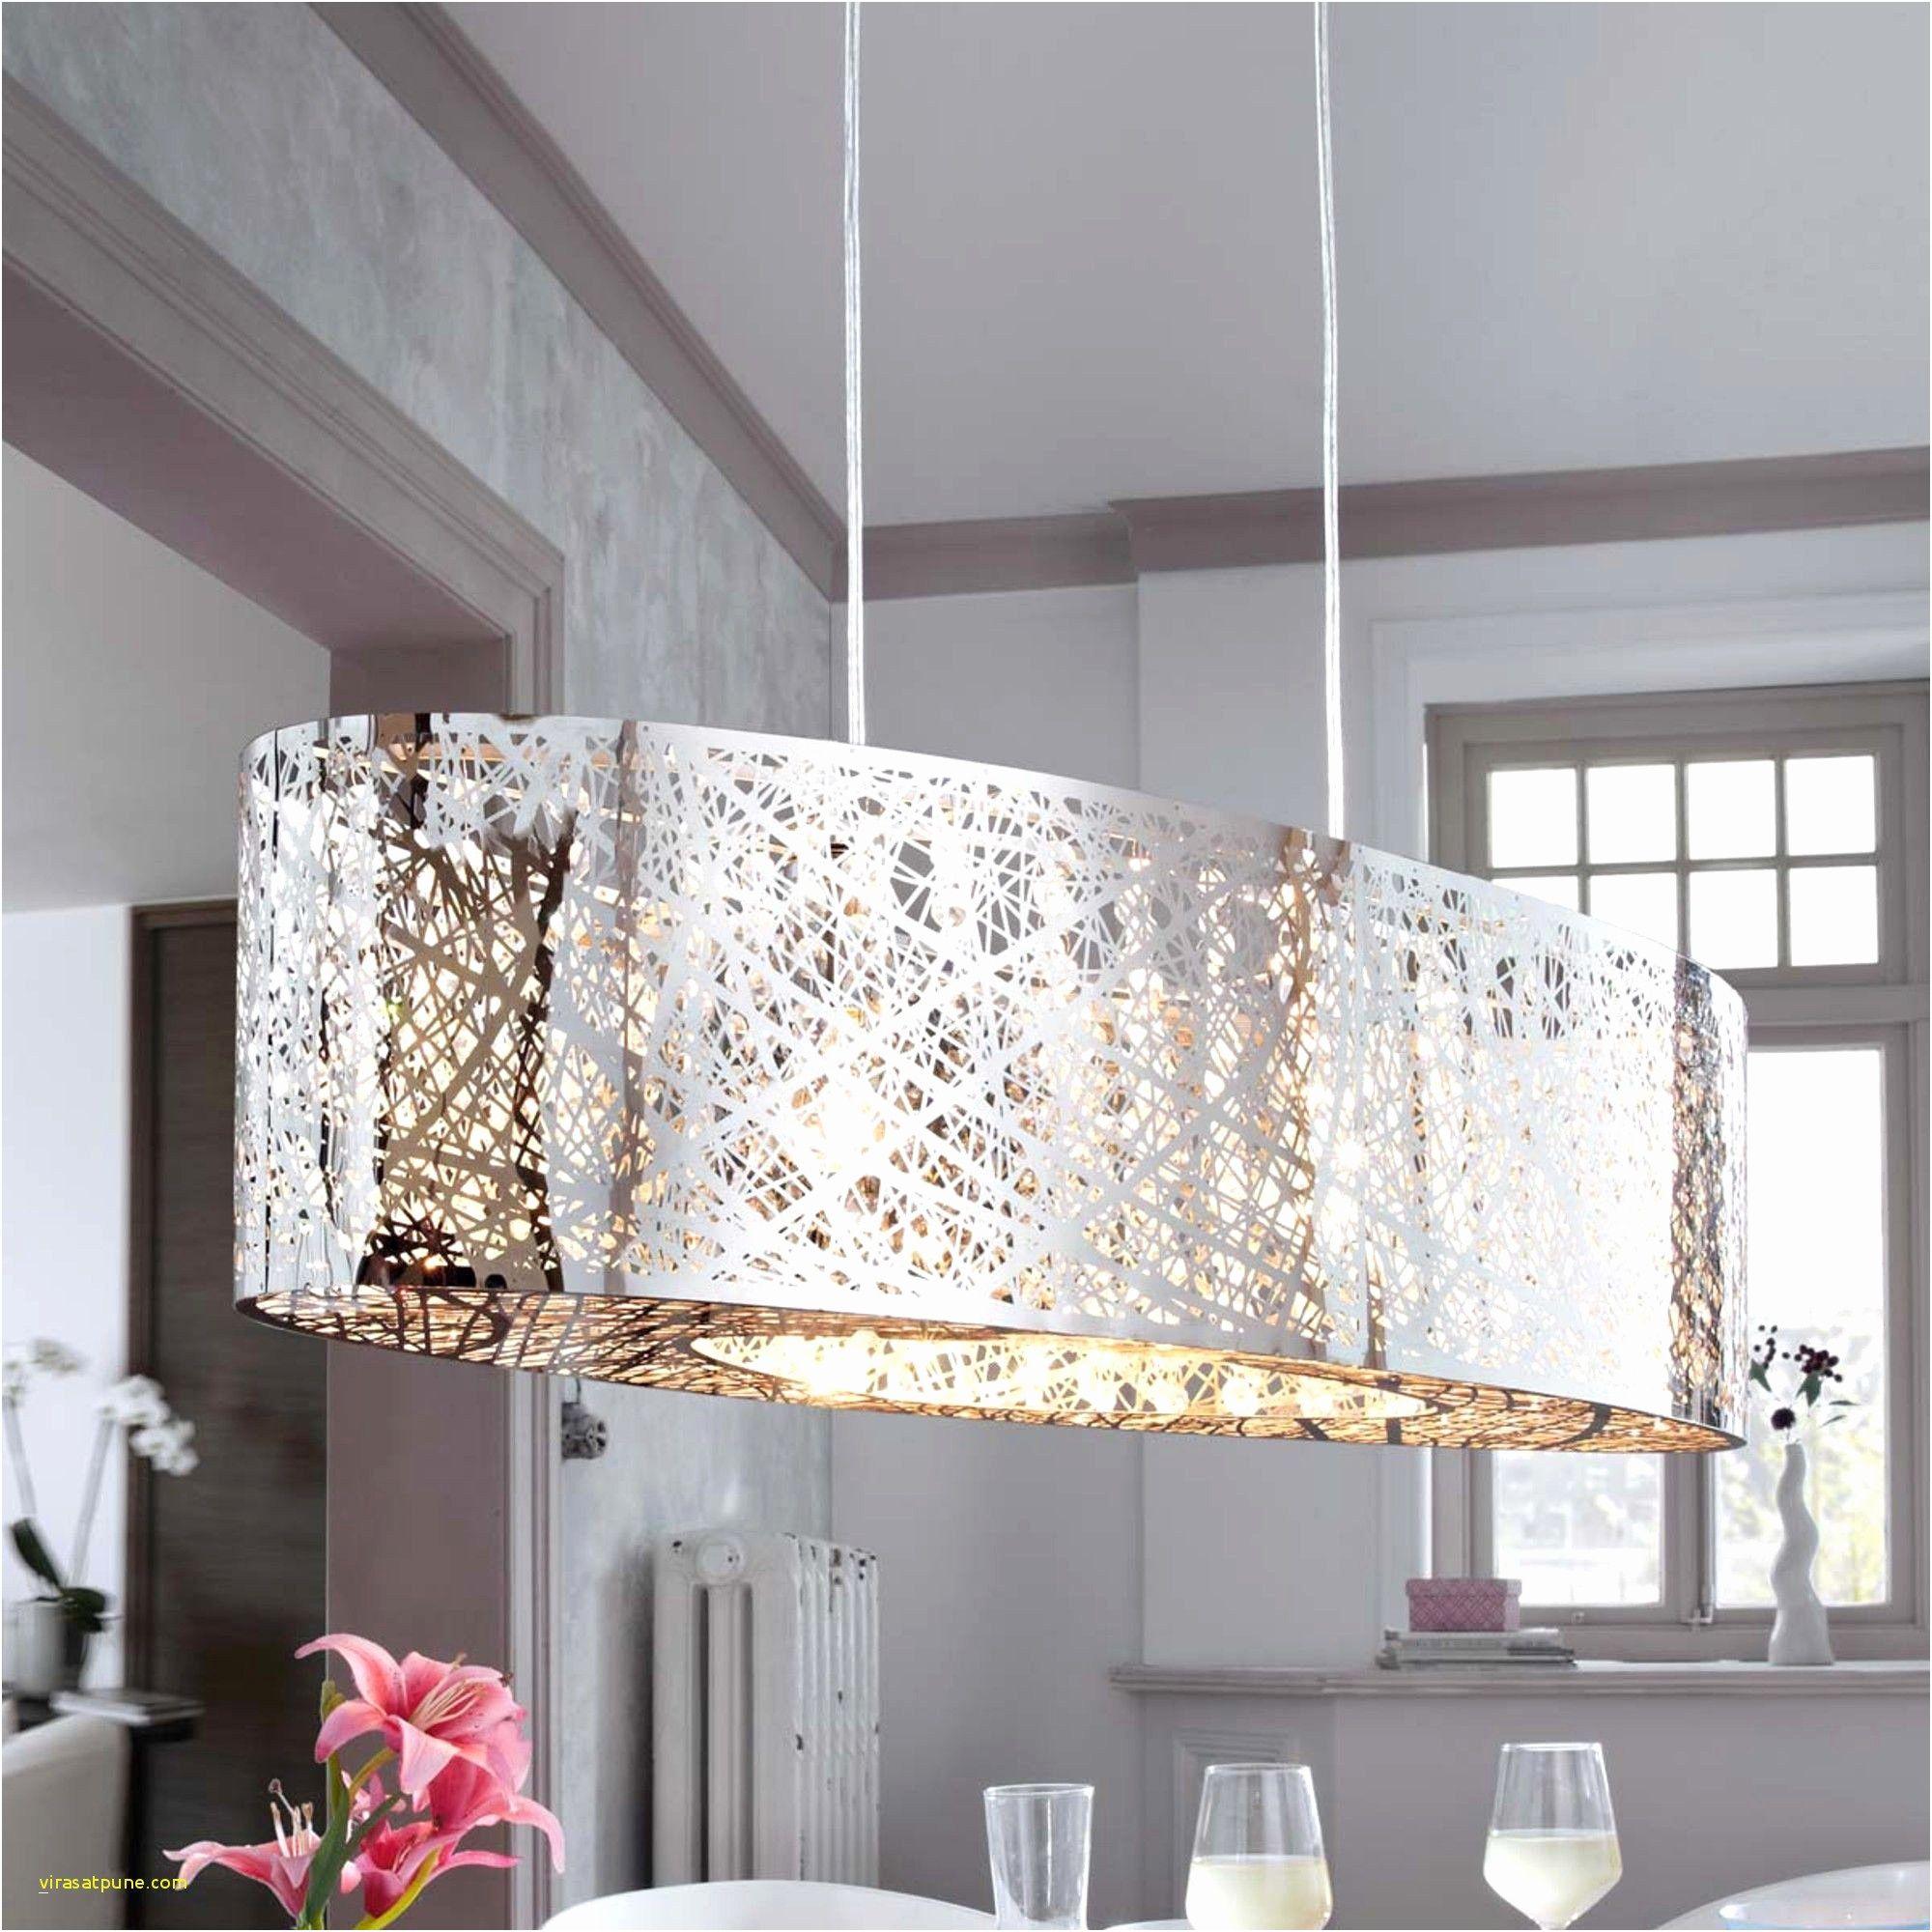 13 Biensur Le Bon Coin Luminaire Gallery Luminaire Lampe Suspension Luminaire Plafond